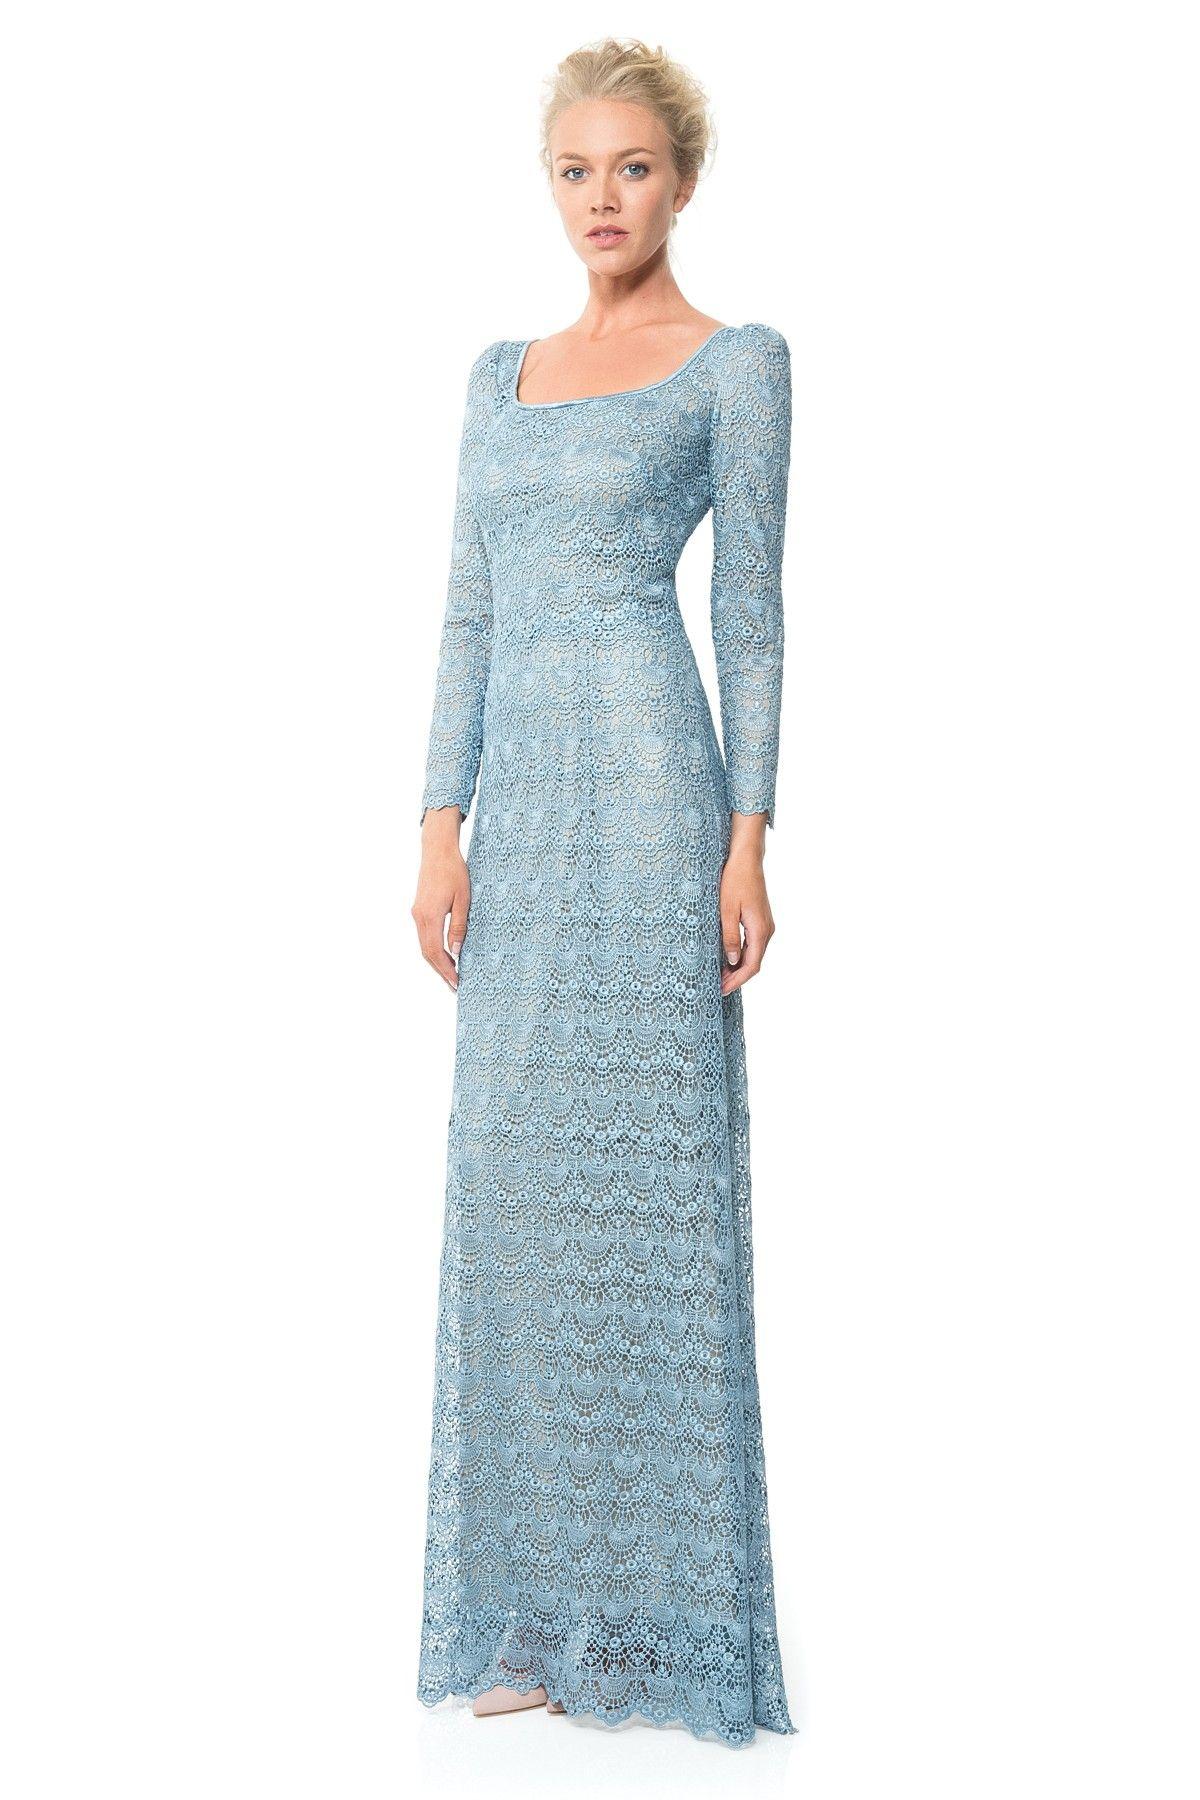 Scallop lace longsleeve gown shop tadashi shoji a formal